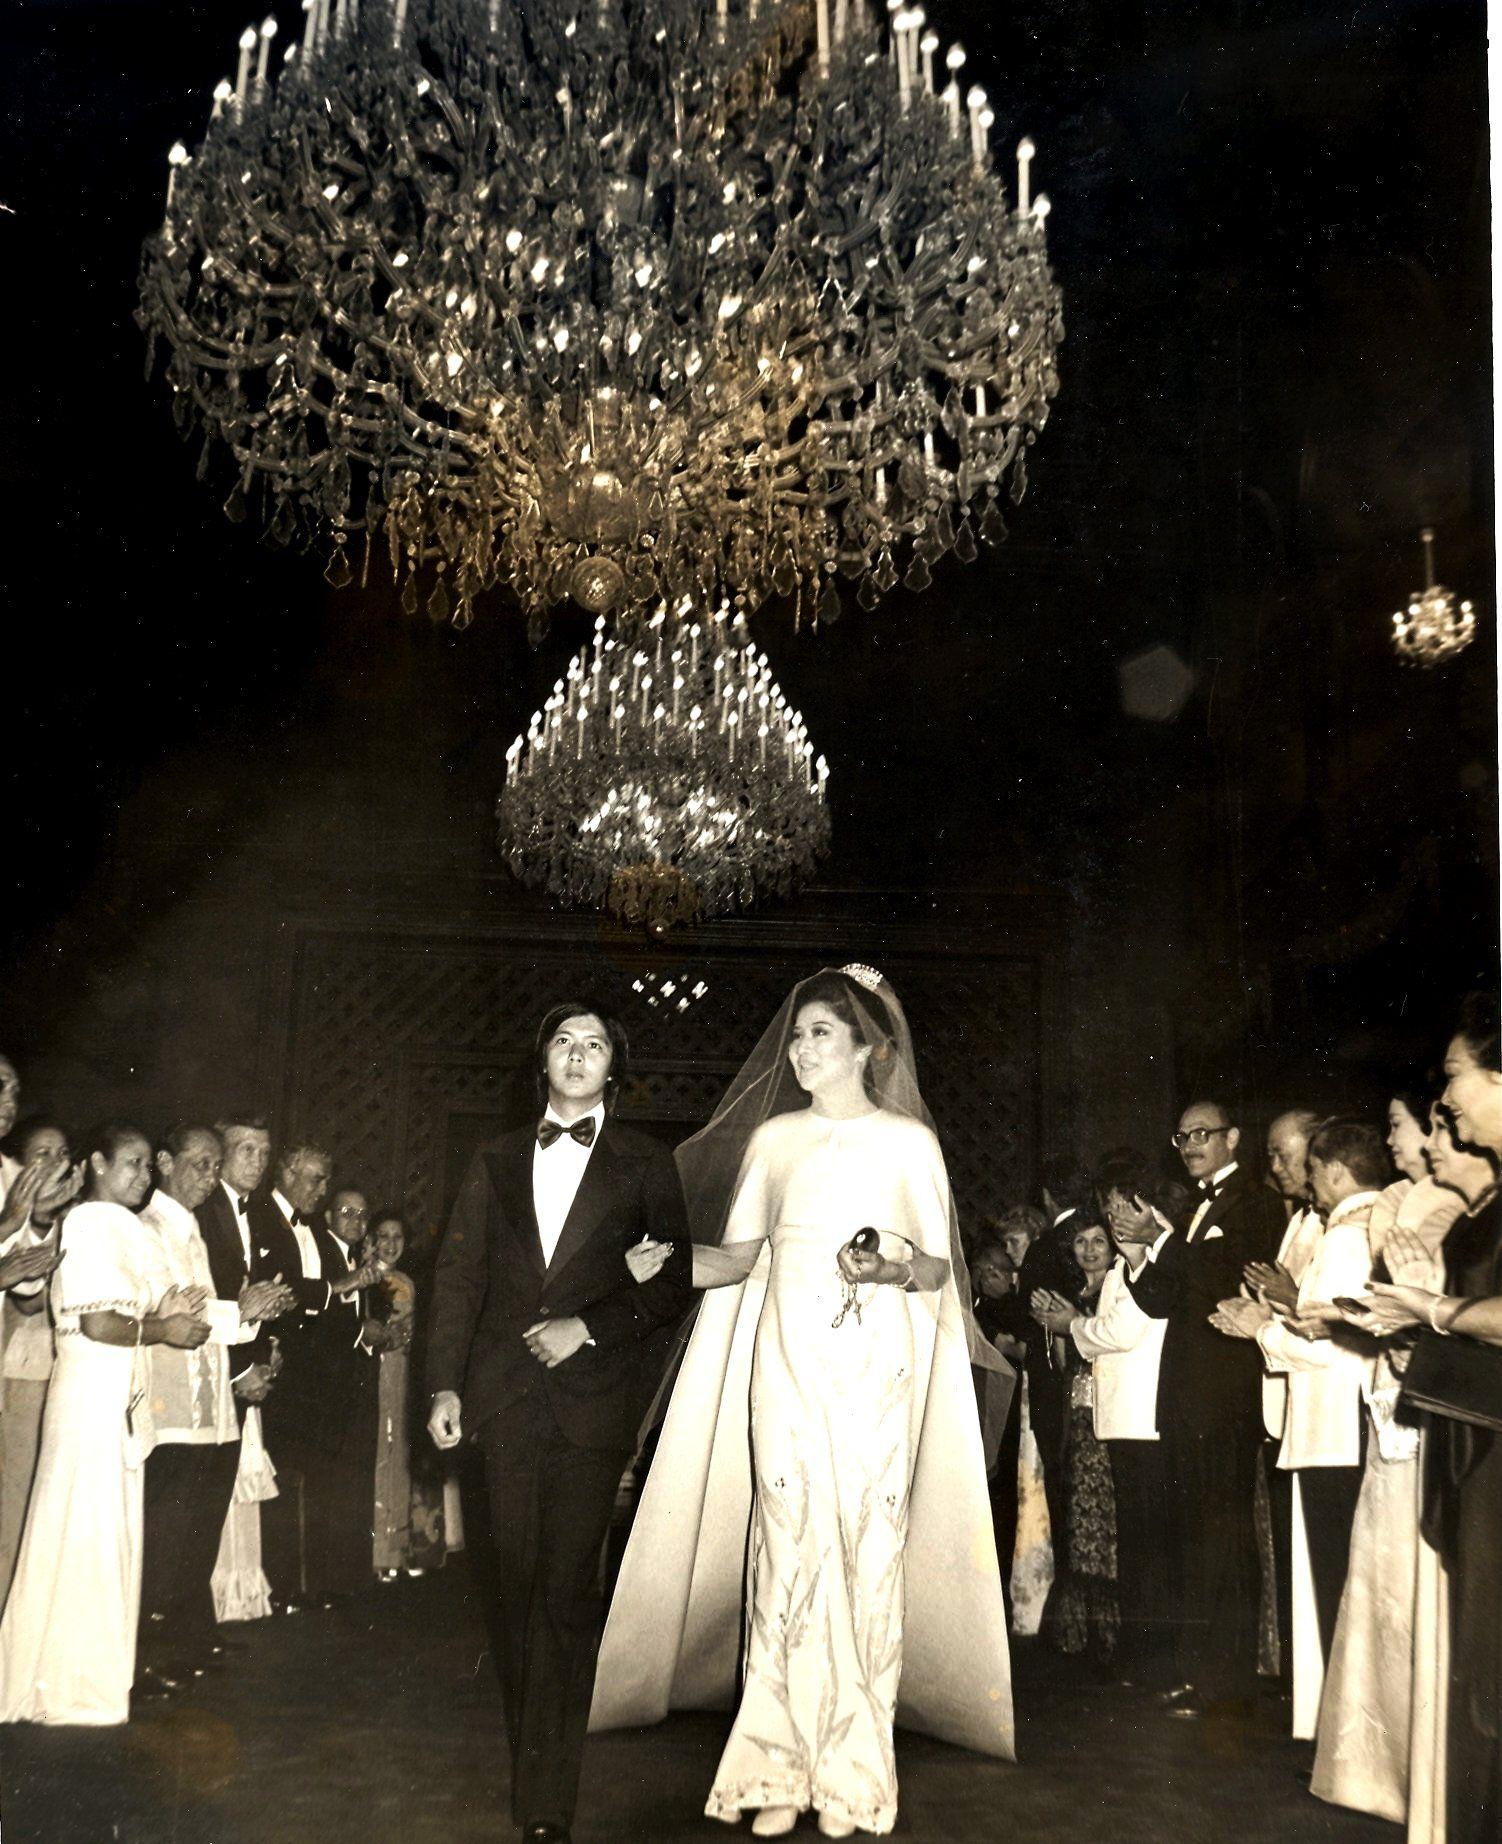 Silver Wedding Anniversary Gowns: Silver Wedding Anniversary